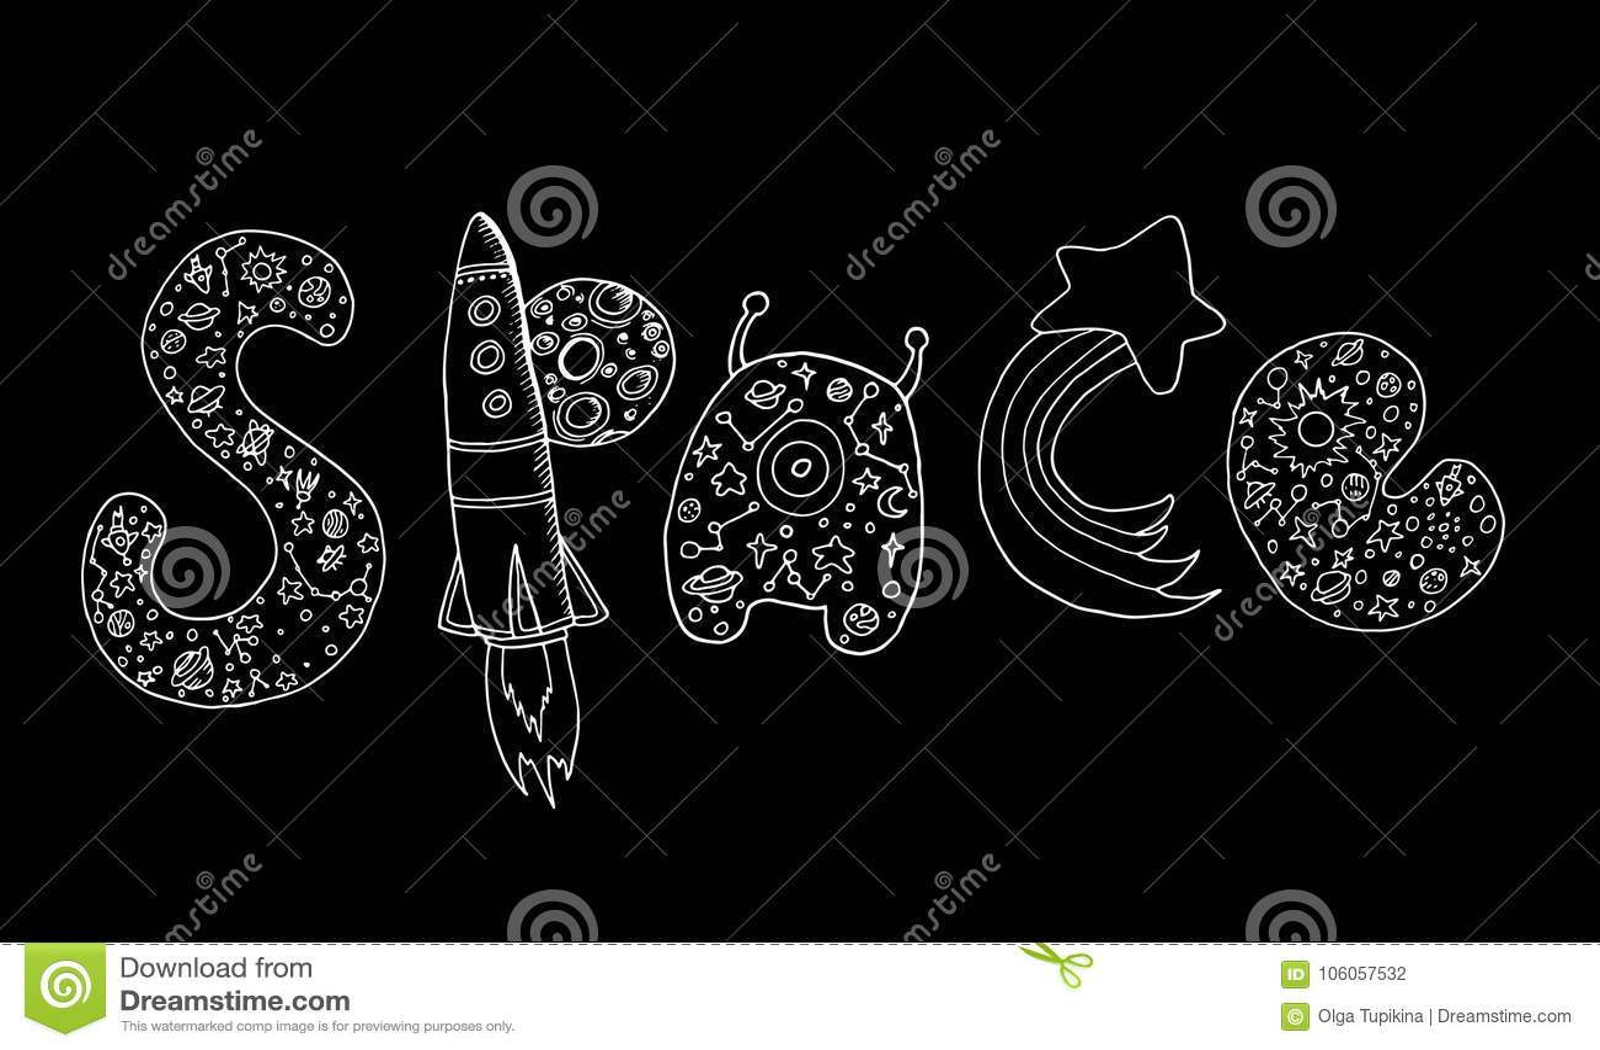 Art Design Decorative Word Space Doodle Sketch Style Stock